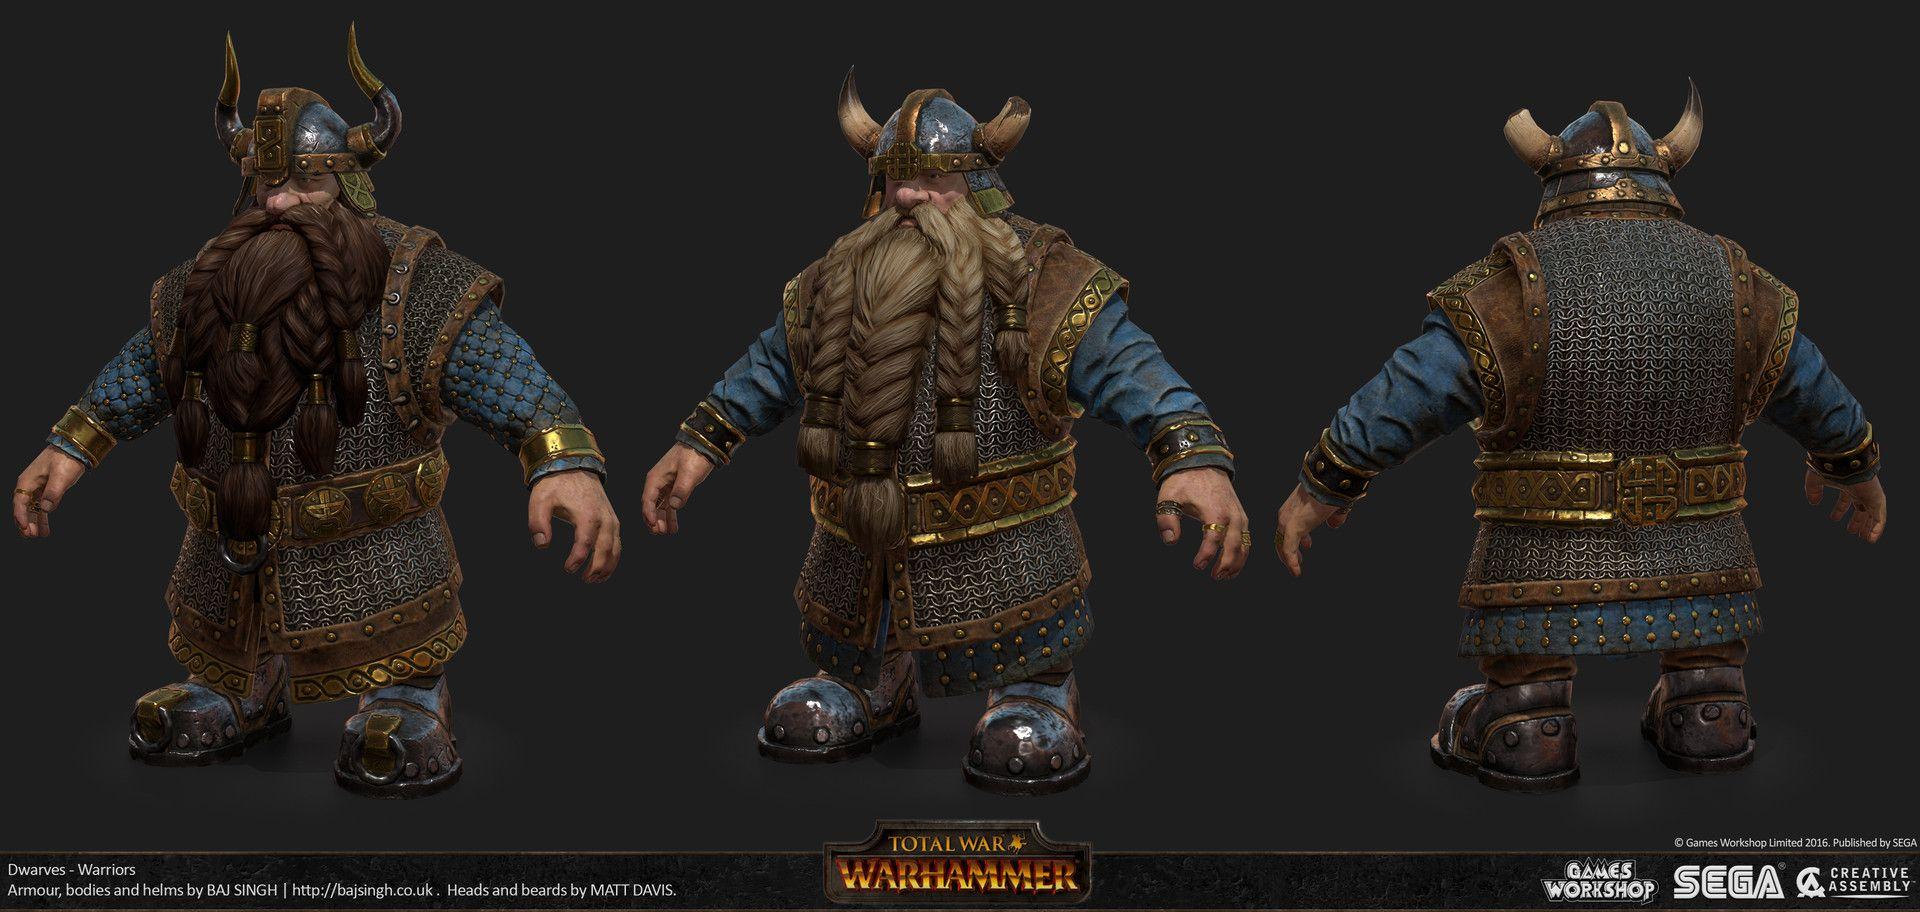 ArtStation Total War Warhammer Art Dump, In game